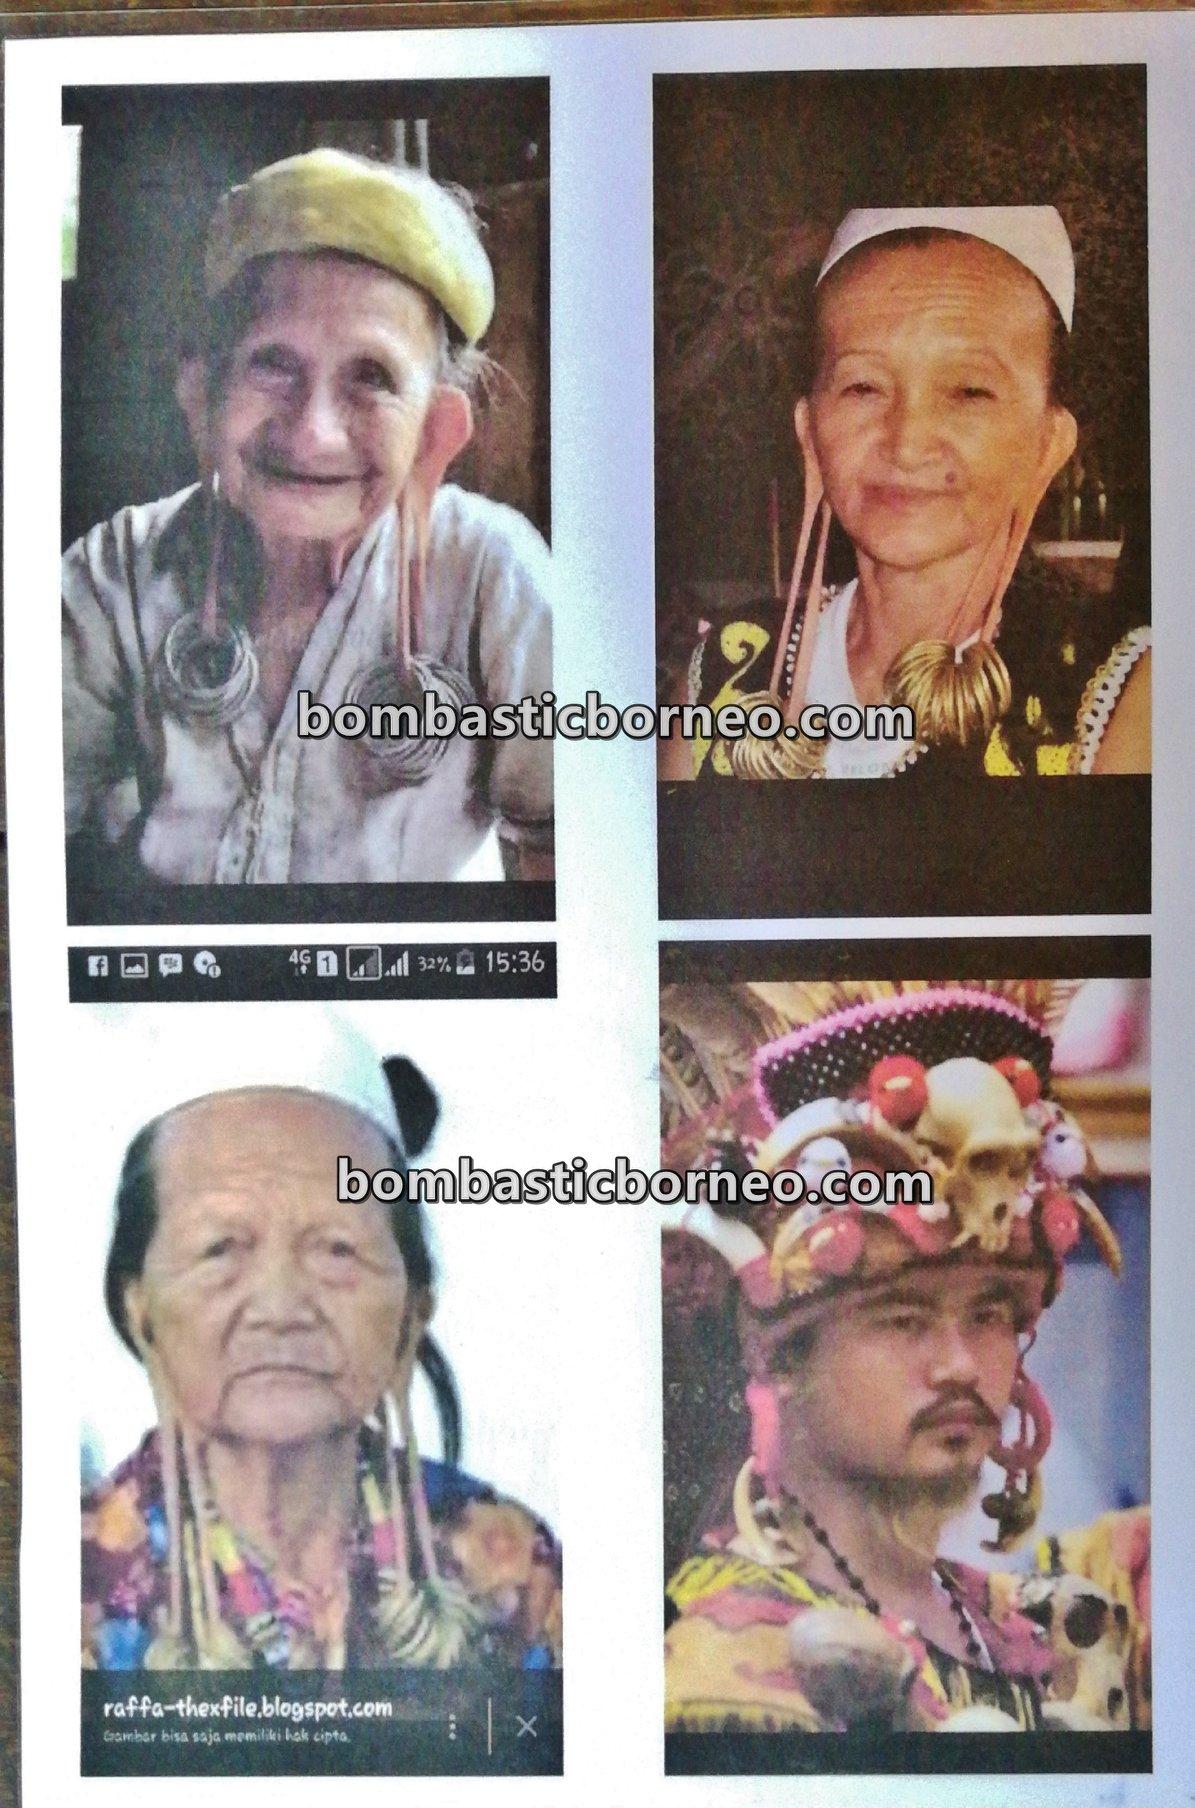 Panglima Siru, Dukun, antiques, Dayak, Ethnic, native, culture, Indonesia, West Kalimantan, Bengkayang, budaya, village, 婆罗洲原住民, 长耳达雅部落, 印尼西加里曼丹